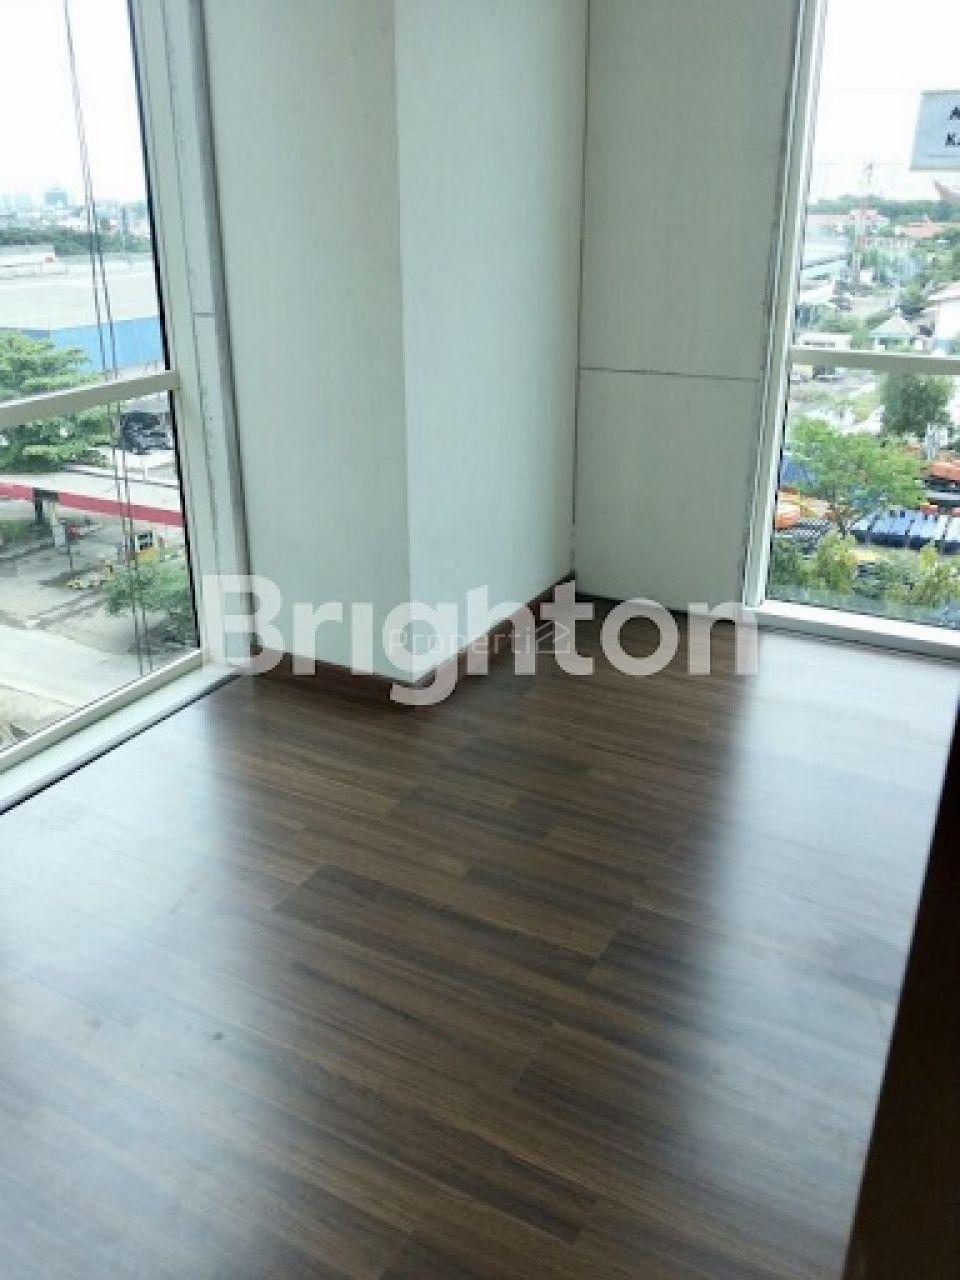 Unit Apartemen 3BR di The Kensington Royal Suites, Jakarta Utara, Jakarta Utara